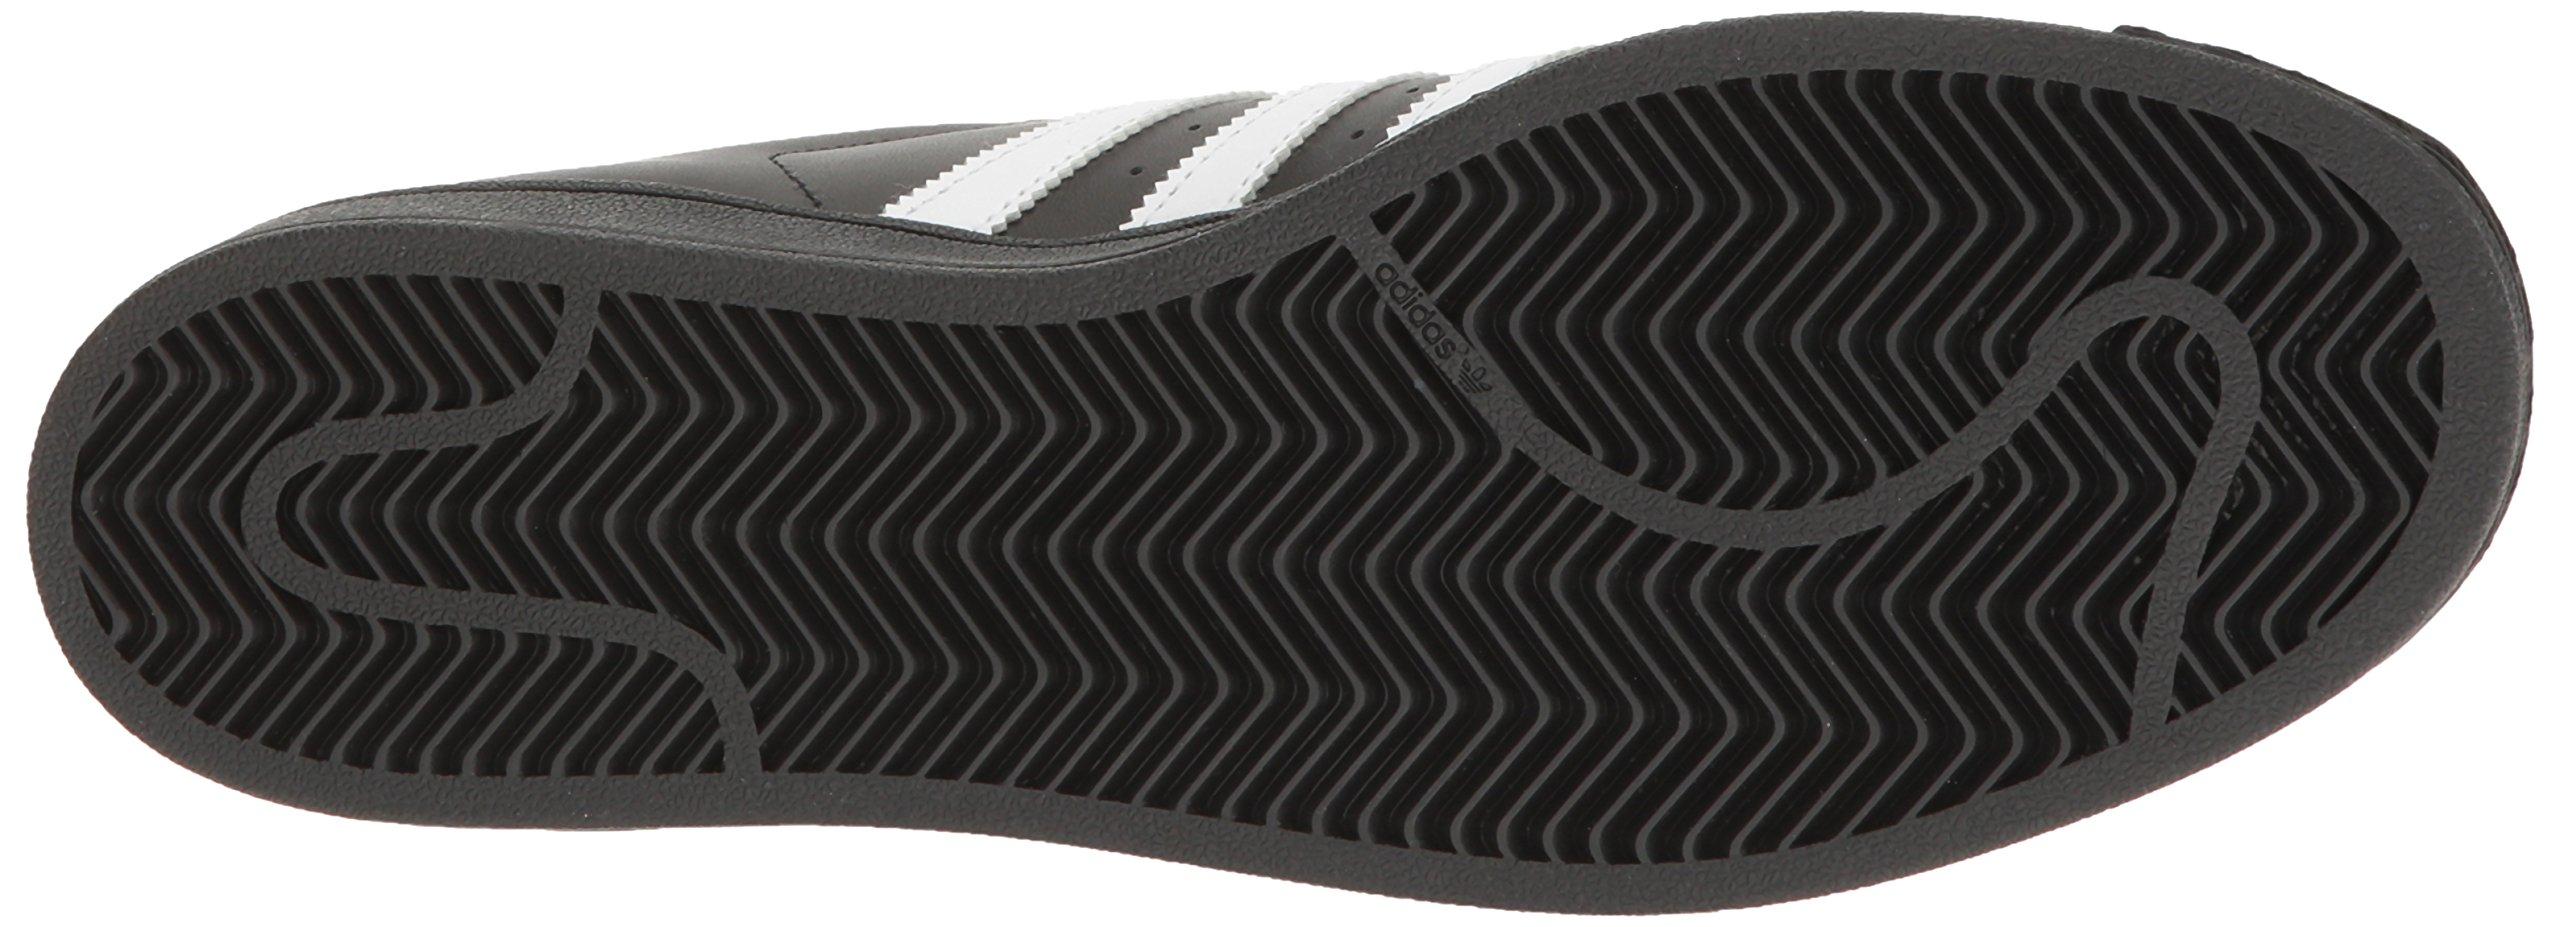 adidas Originals Men's Superstar Shoe Running White/Black, 8.5 D(M) US